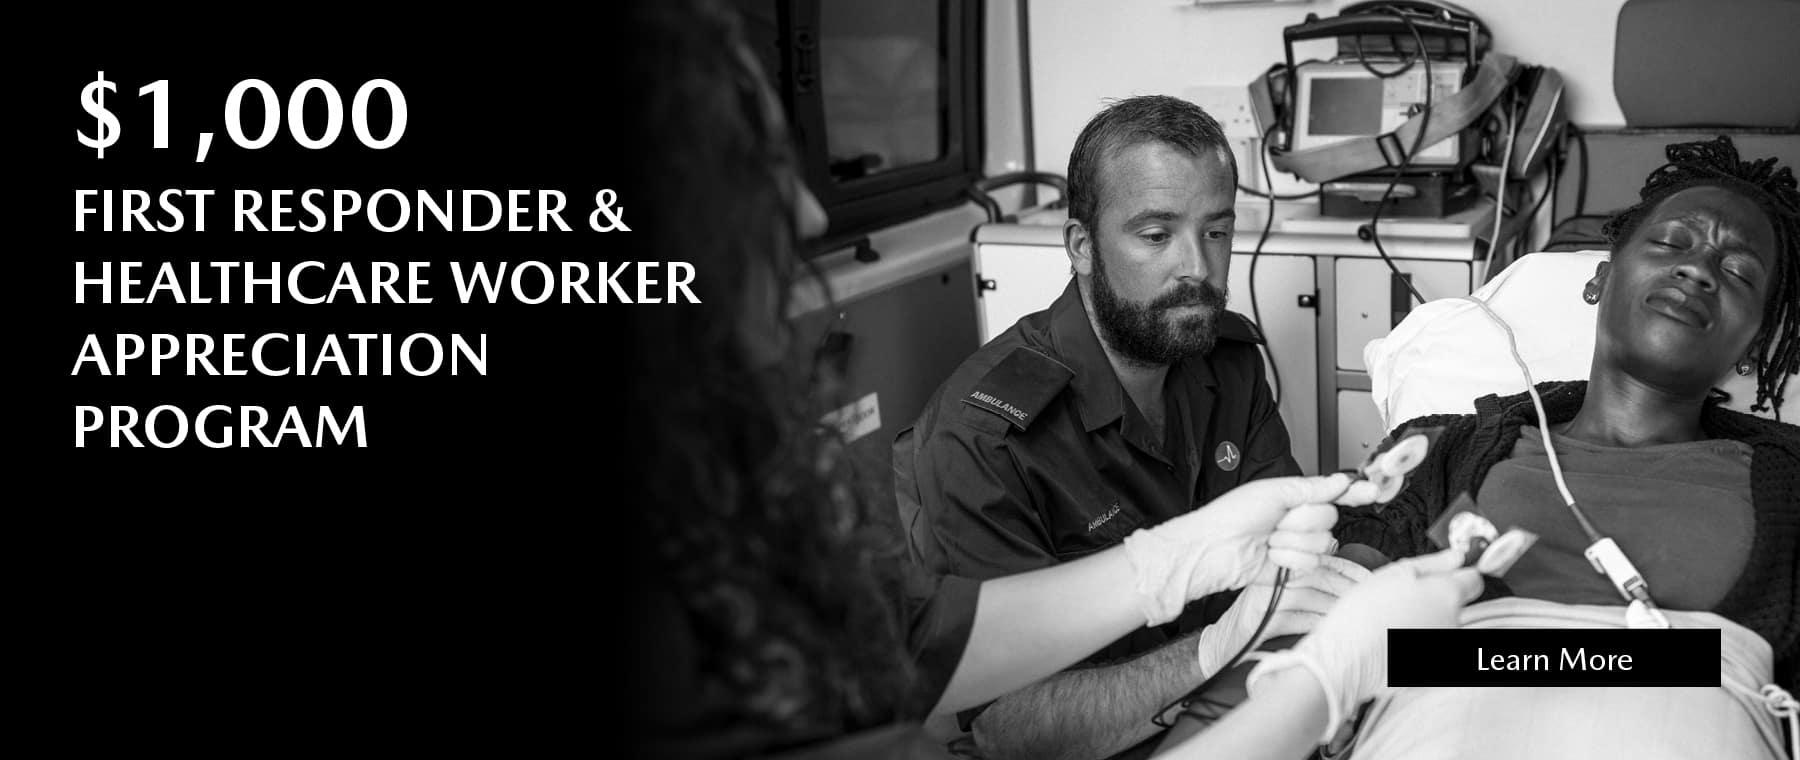 $1,000 First responder & healthcare worker appreciation program